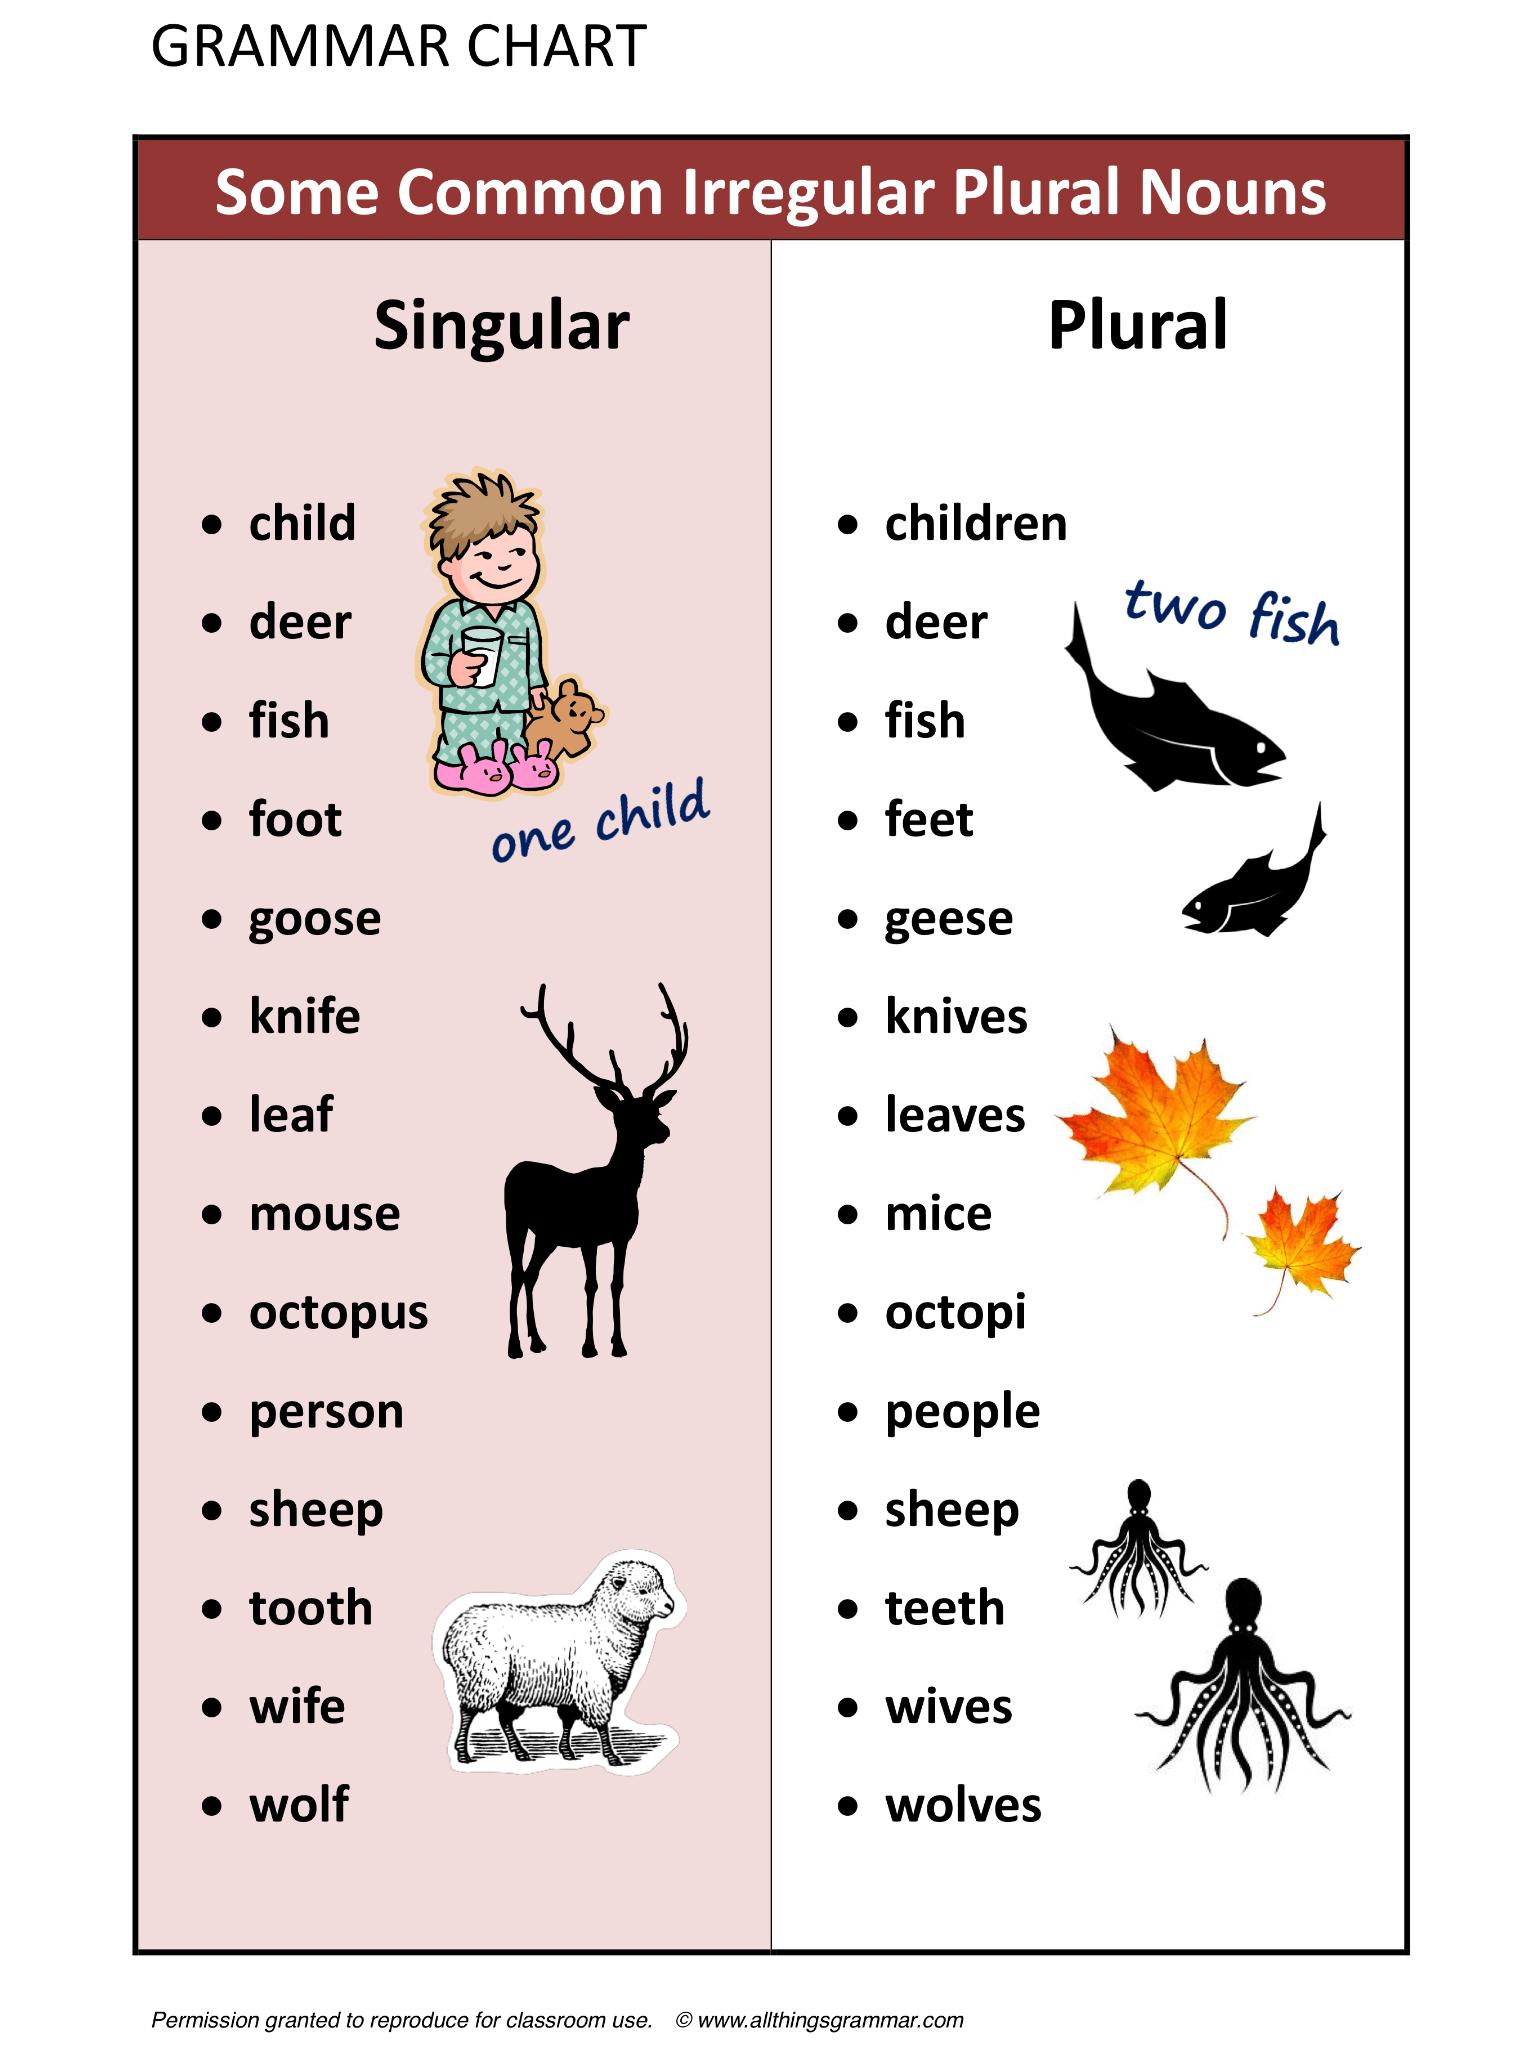 Some Common Irregular Plural Nouns